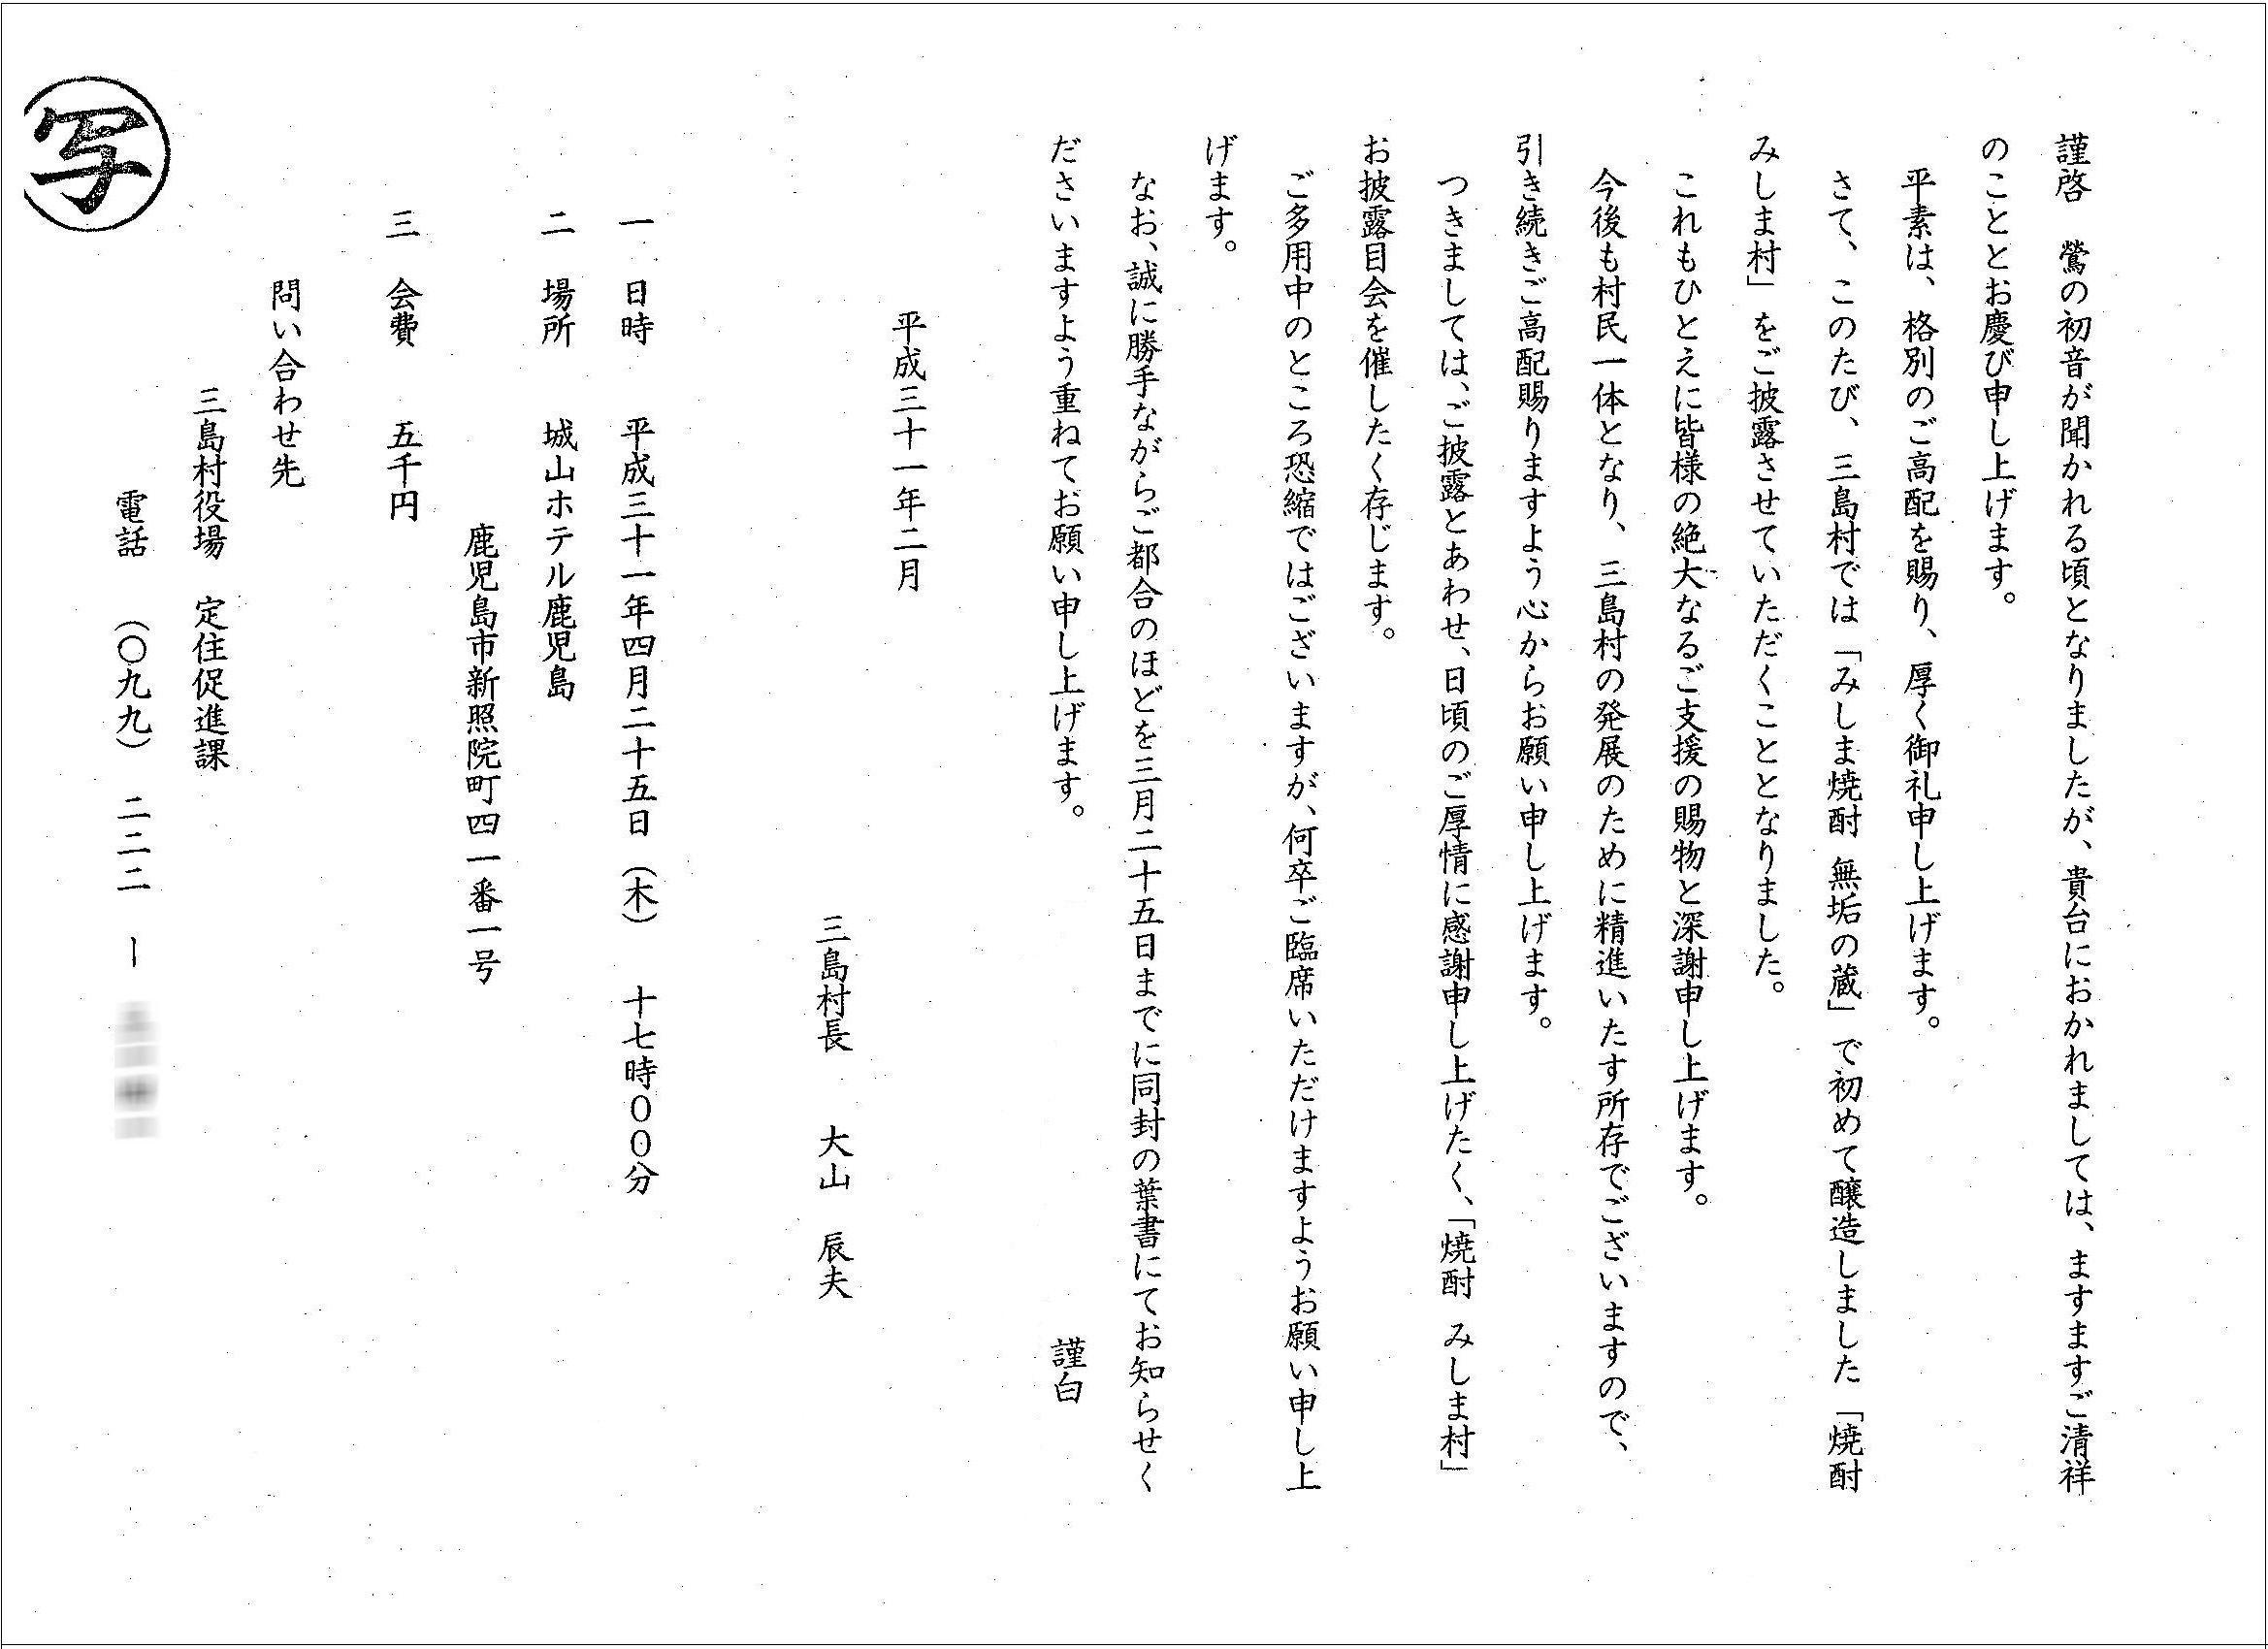 http://hunter-investigate.jp/news/dfcf81d190cf445ac262bcce0127c57fdb248549.jpg